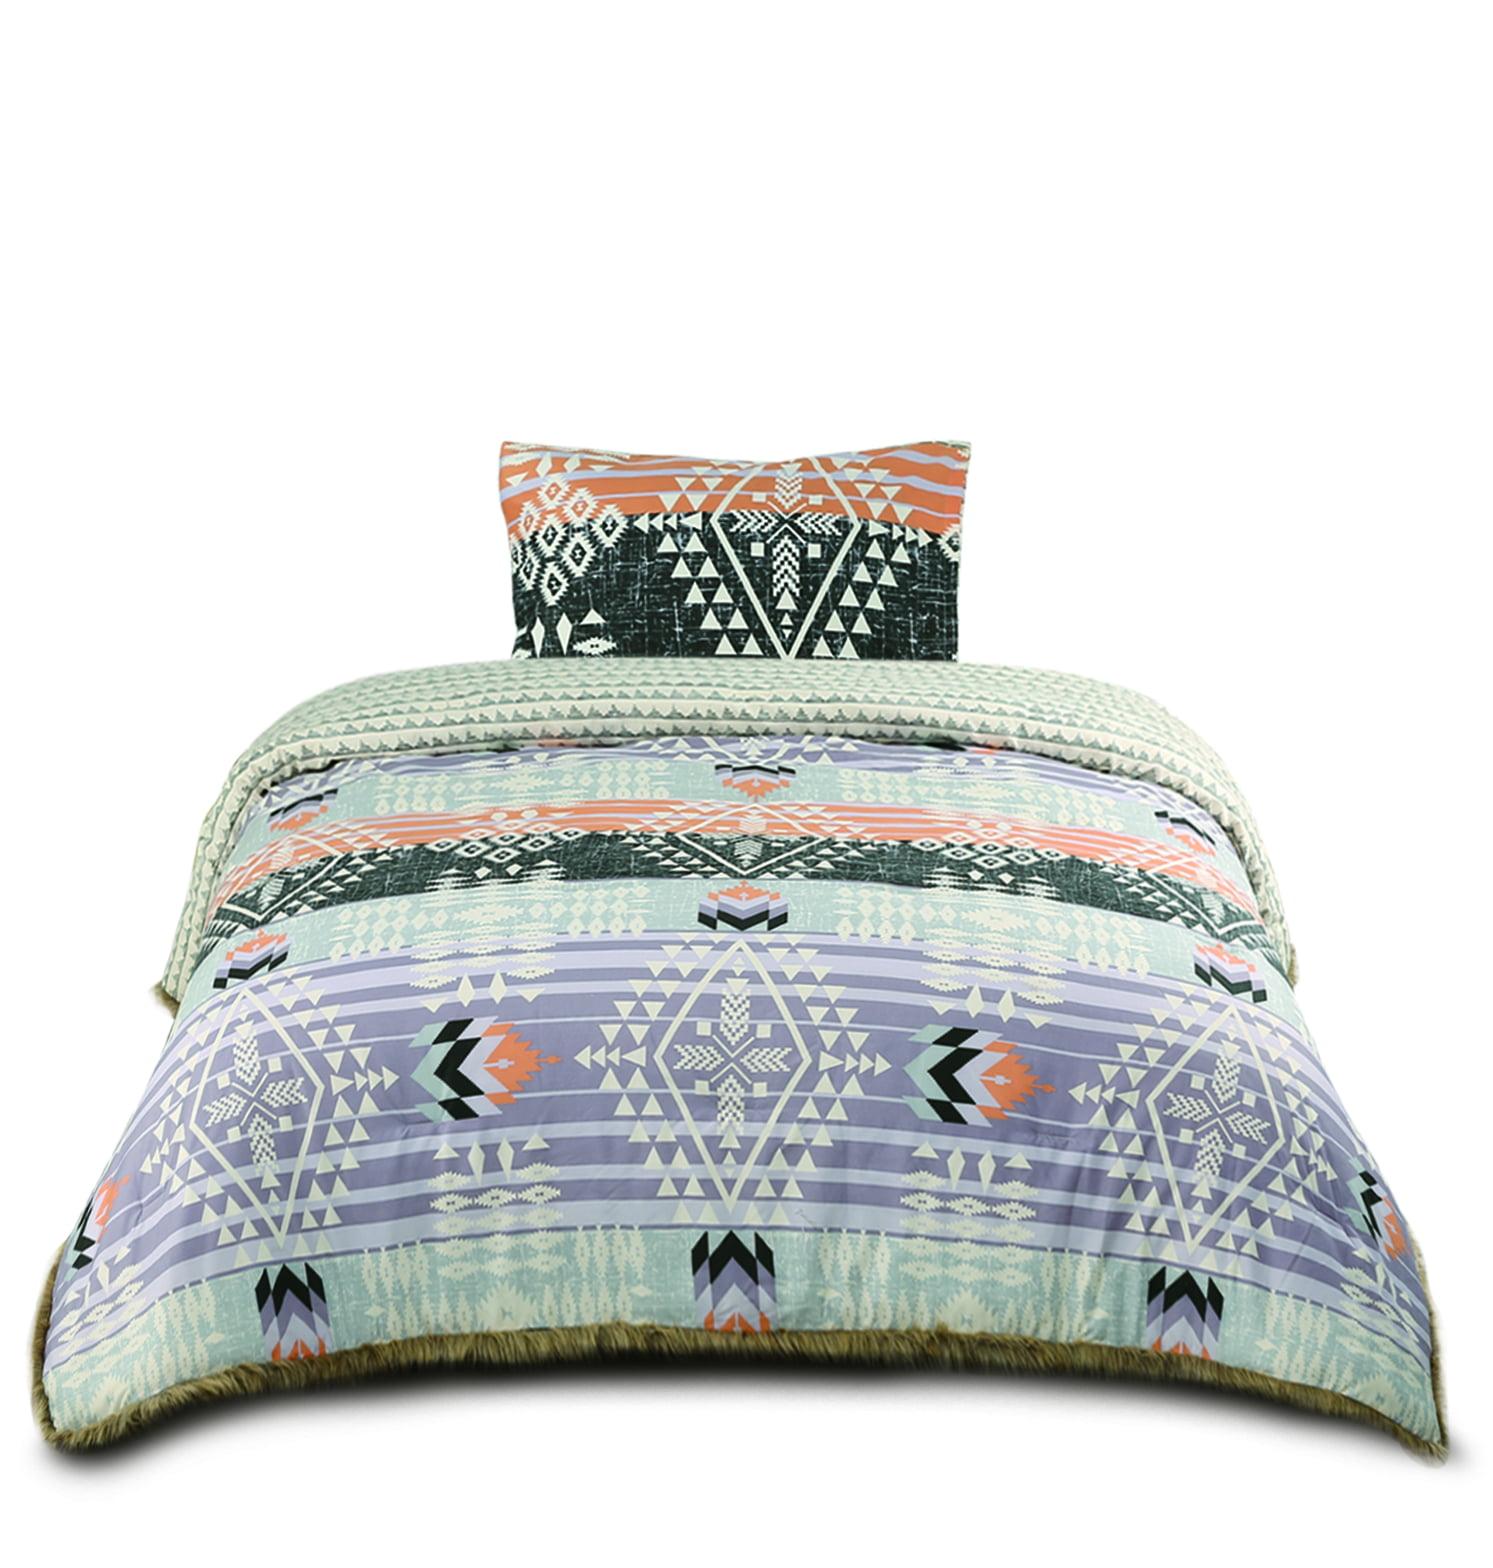 Muk Luks Bohemian Style Comforter Set With Fur Trim Matching Sham Twin Size Peach Purple Walmart Com Walmart Com